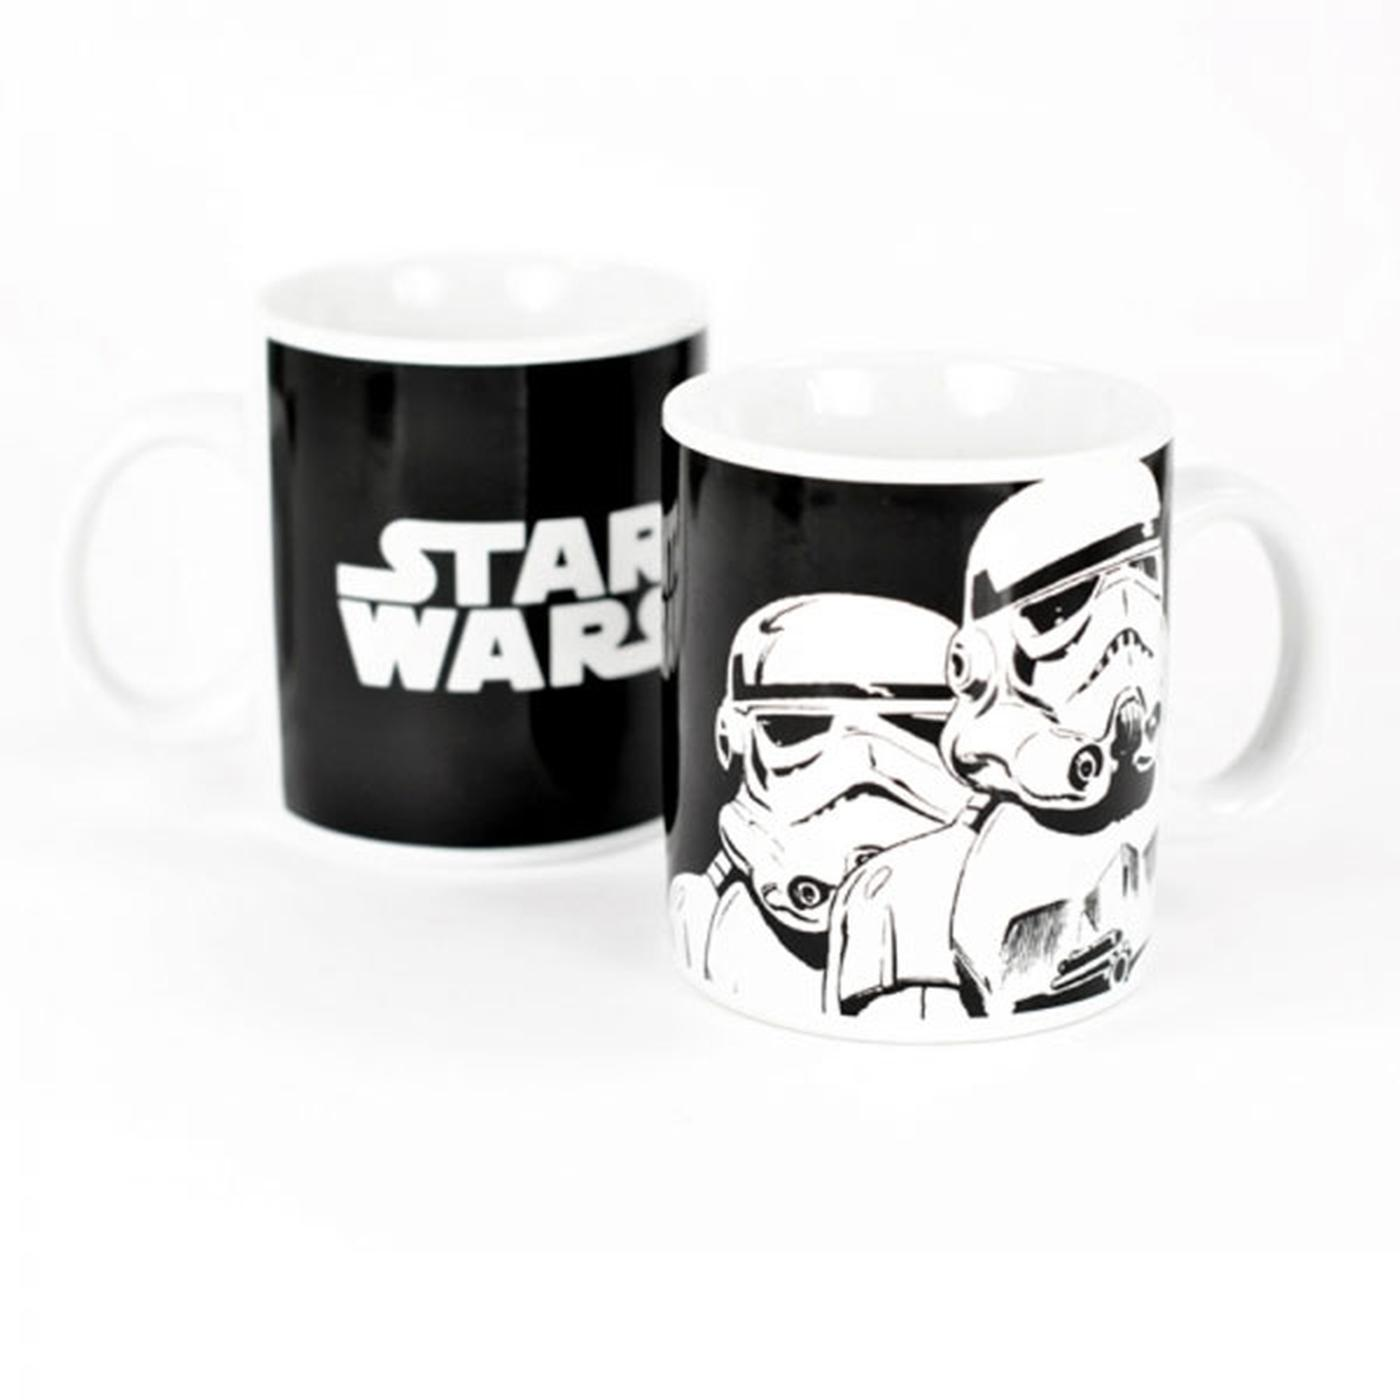 Star Wars Storm Trooper Dark Side Retro 70s Mug